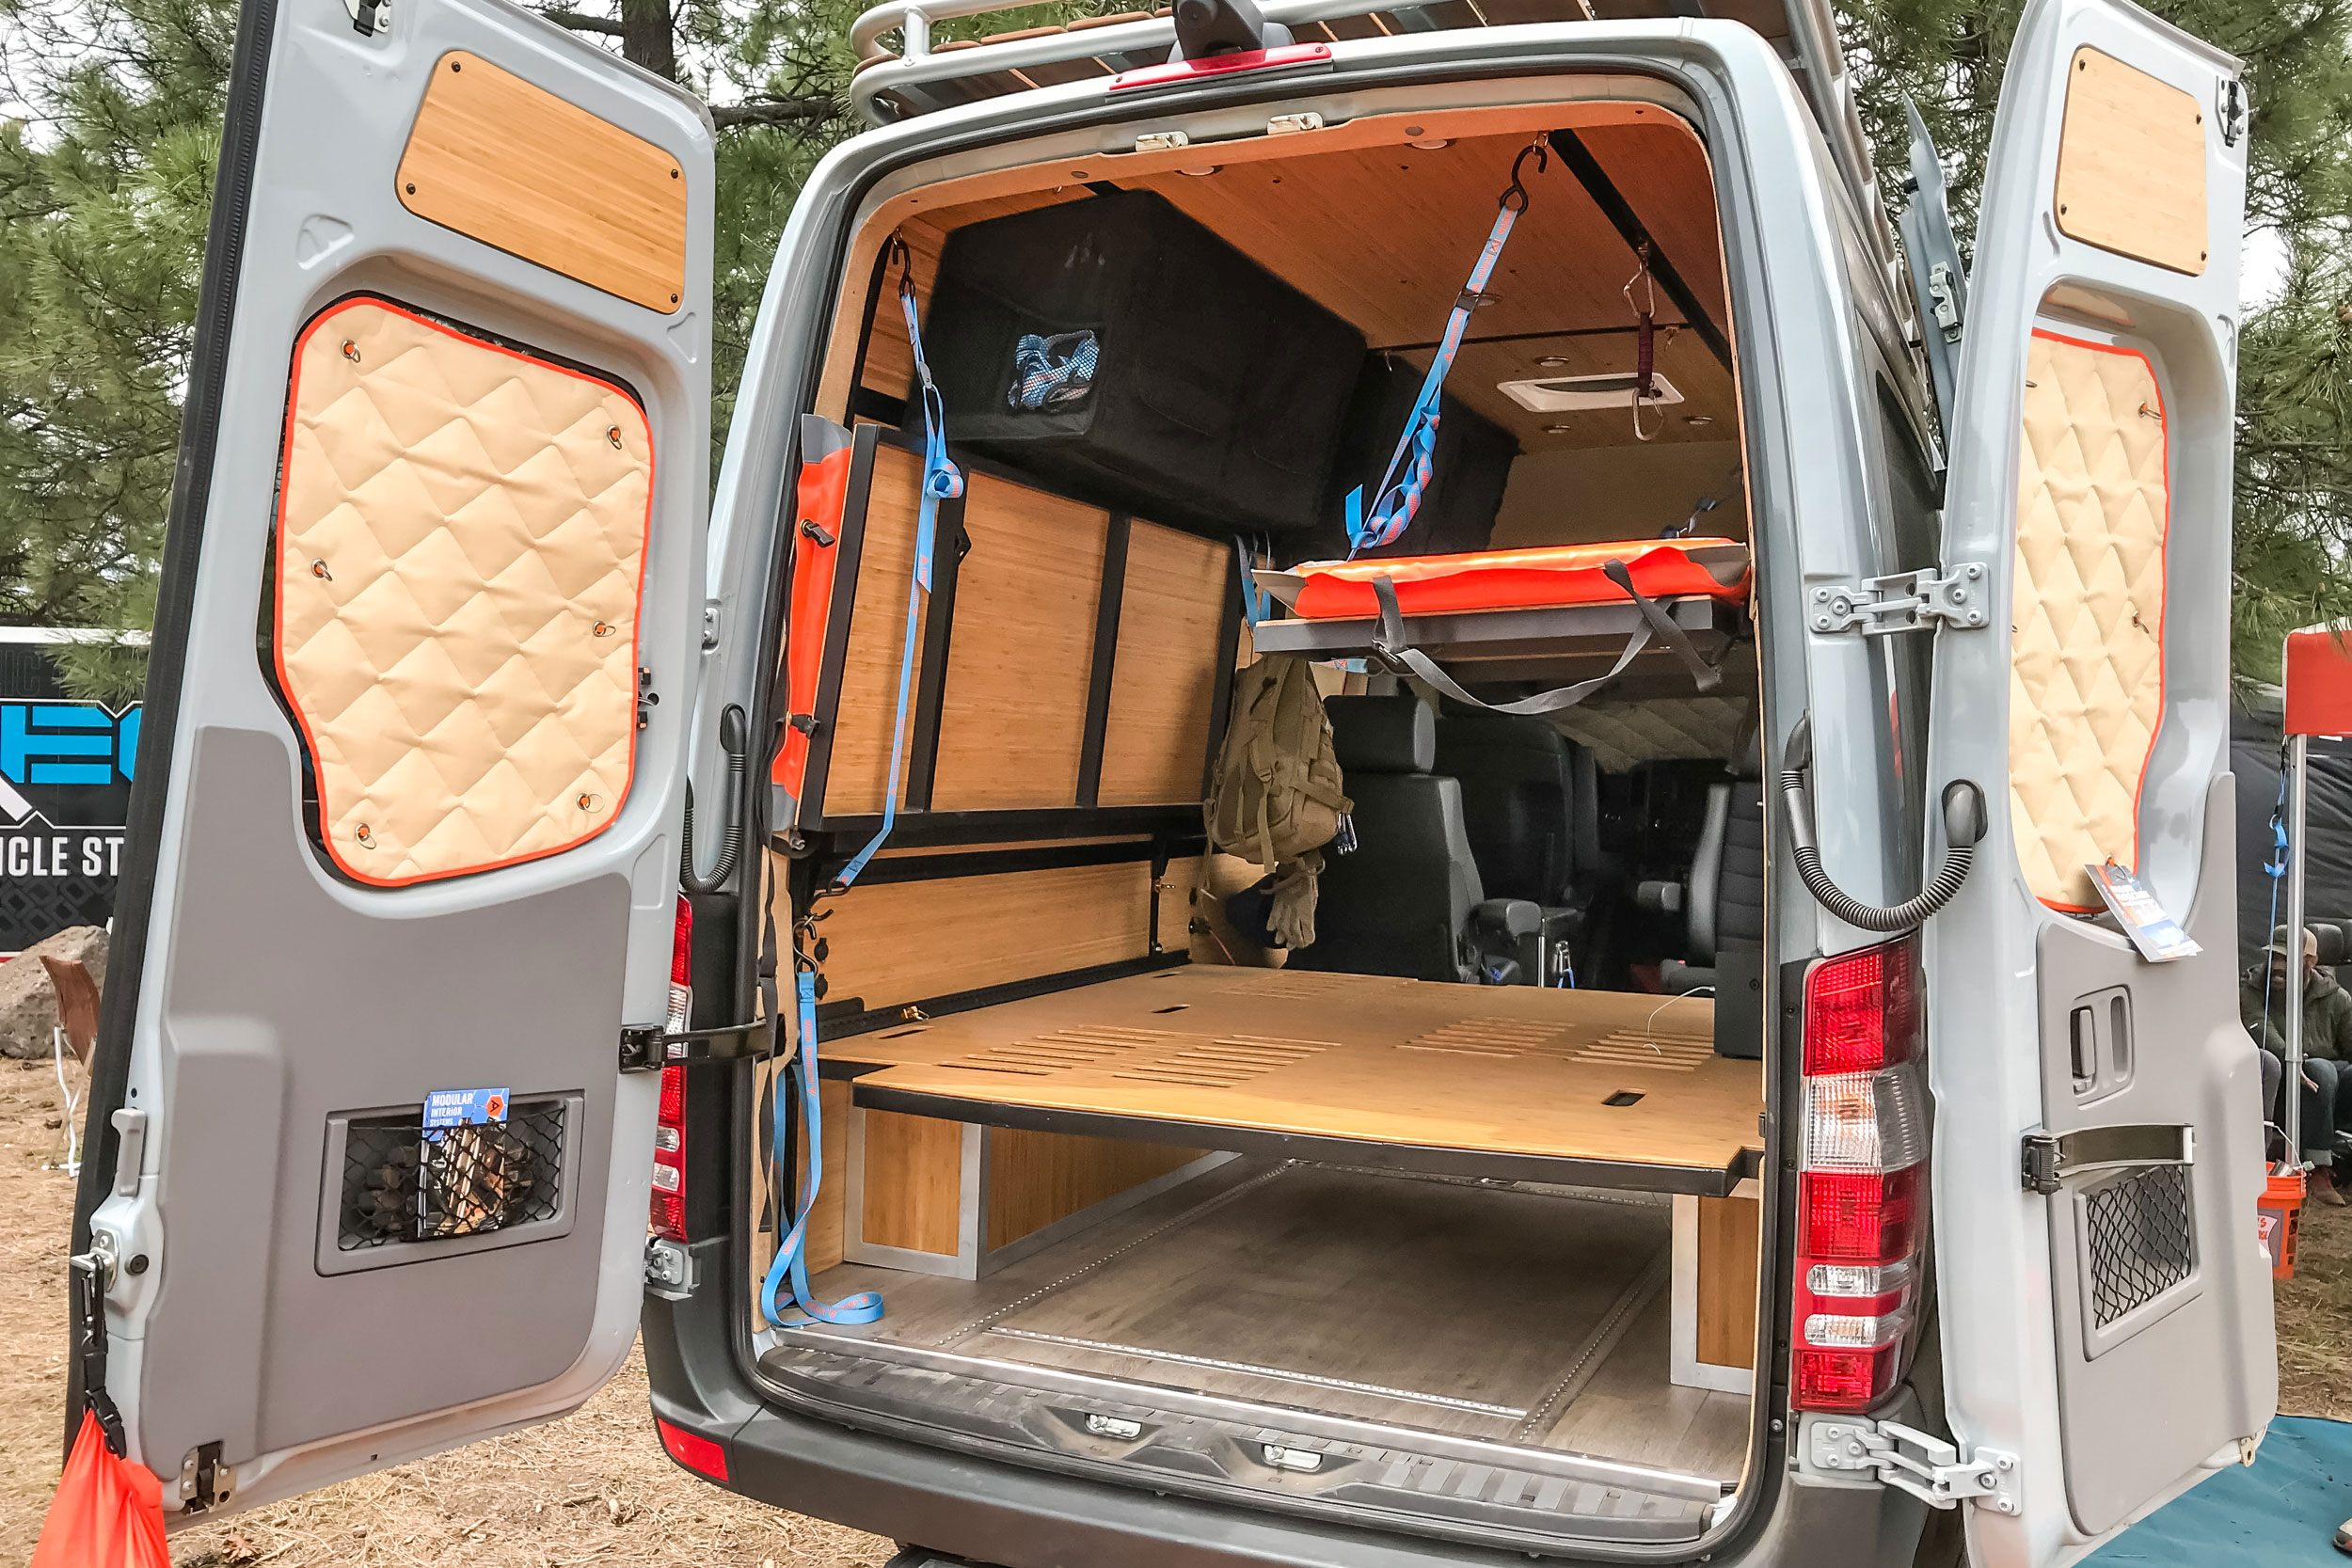 Adventure Wagon RUV 2.0